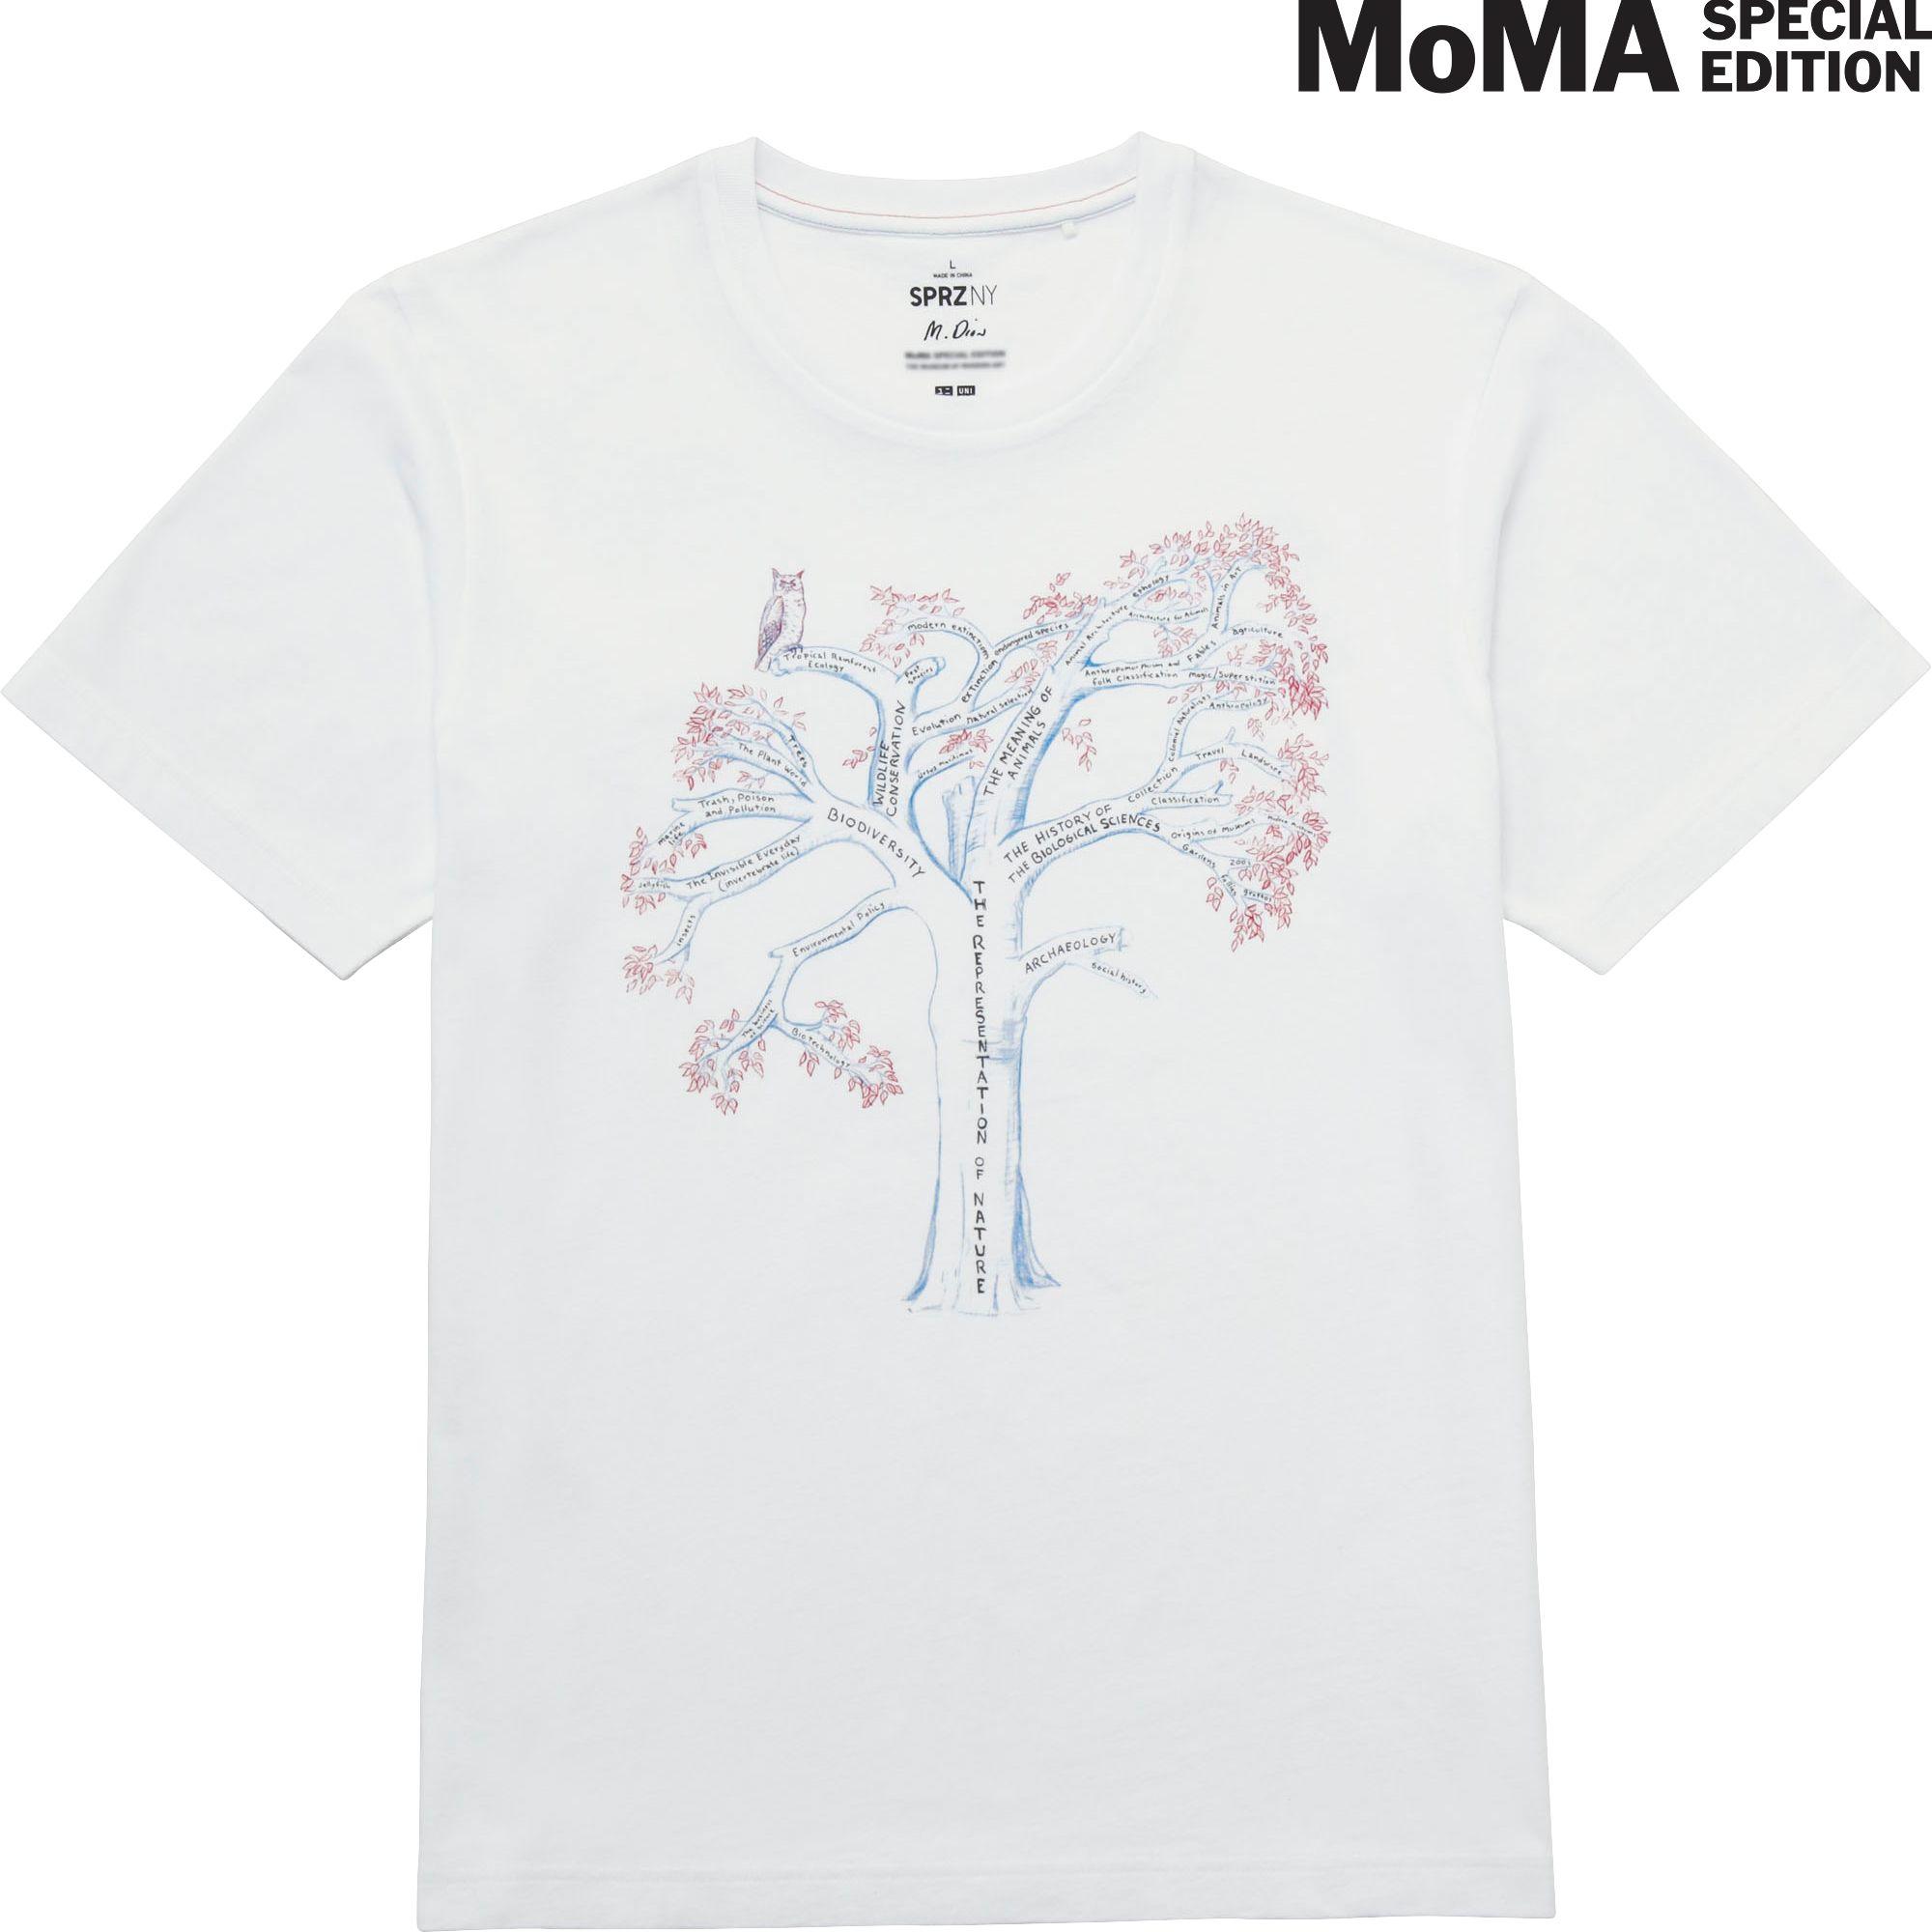 Uniqlo men sprz ny graphic t shirt mark dion in white for Uniqlo moma t shirt